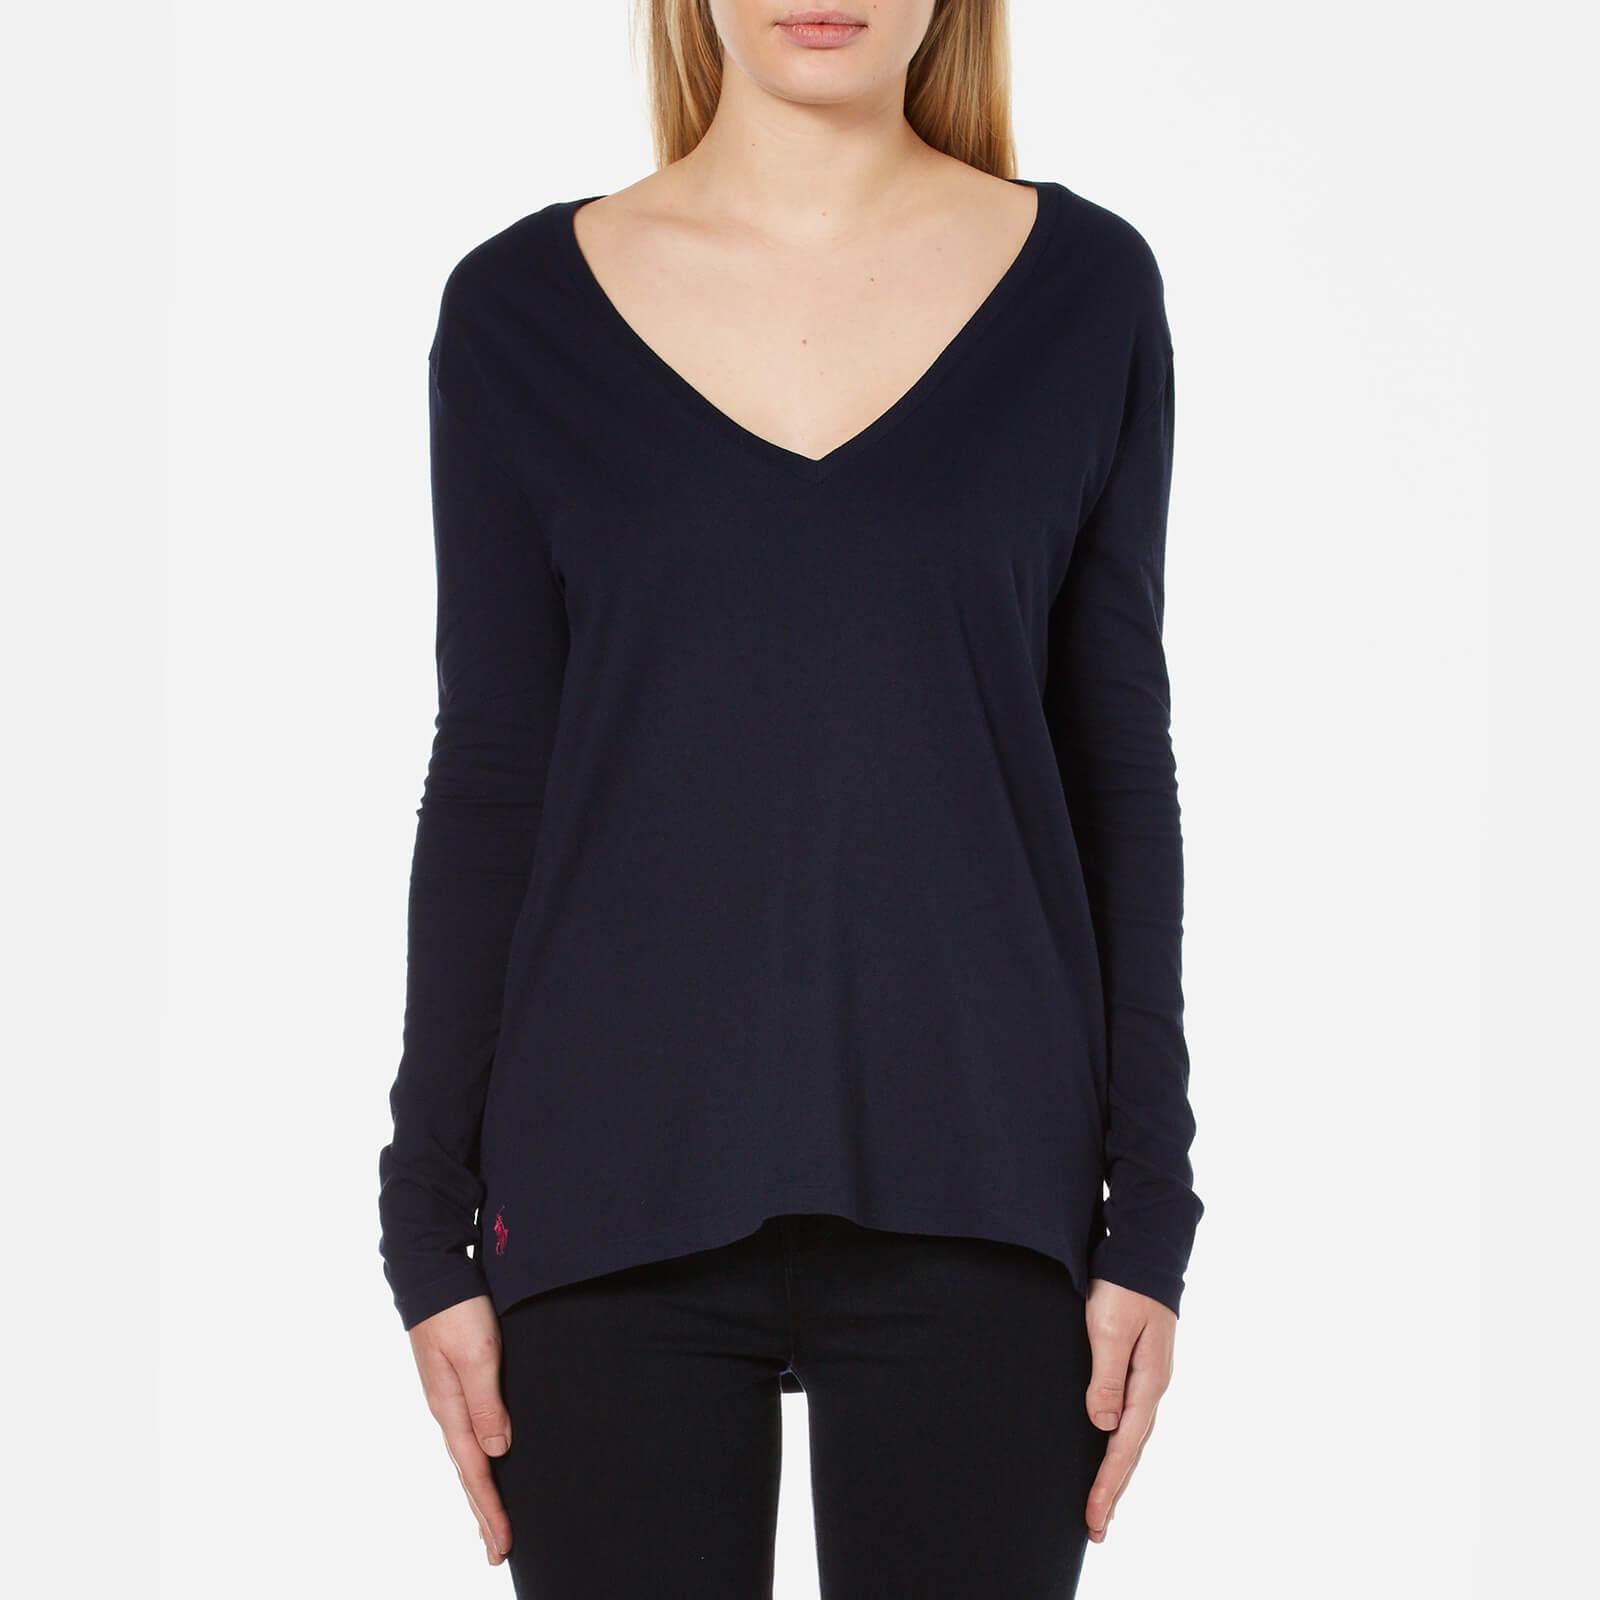 Polo Ralph Lauren Women s Long Sleeve V Neck T-Shirt - Hunter Navy - Free  UK Delivery over £50 3d56fbe44